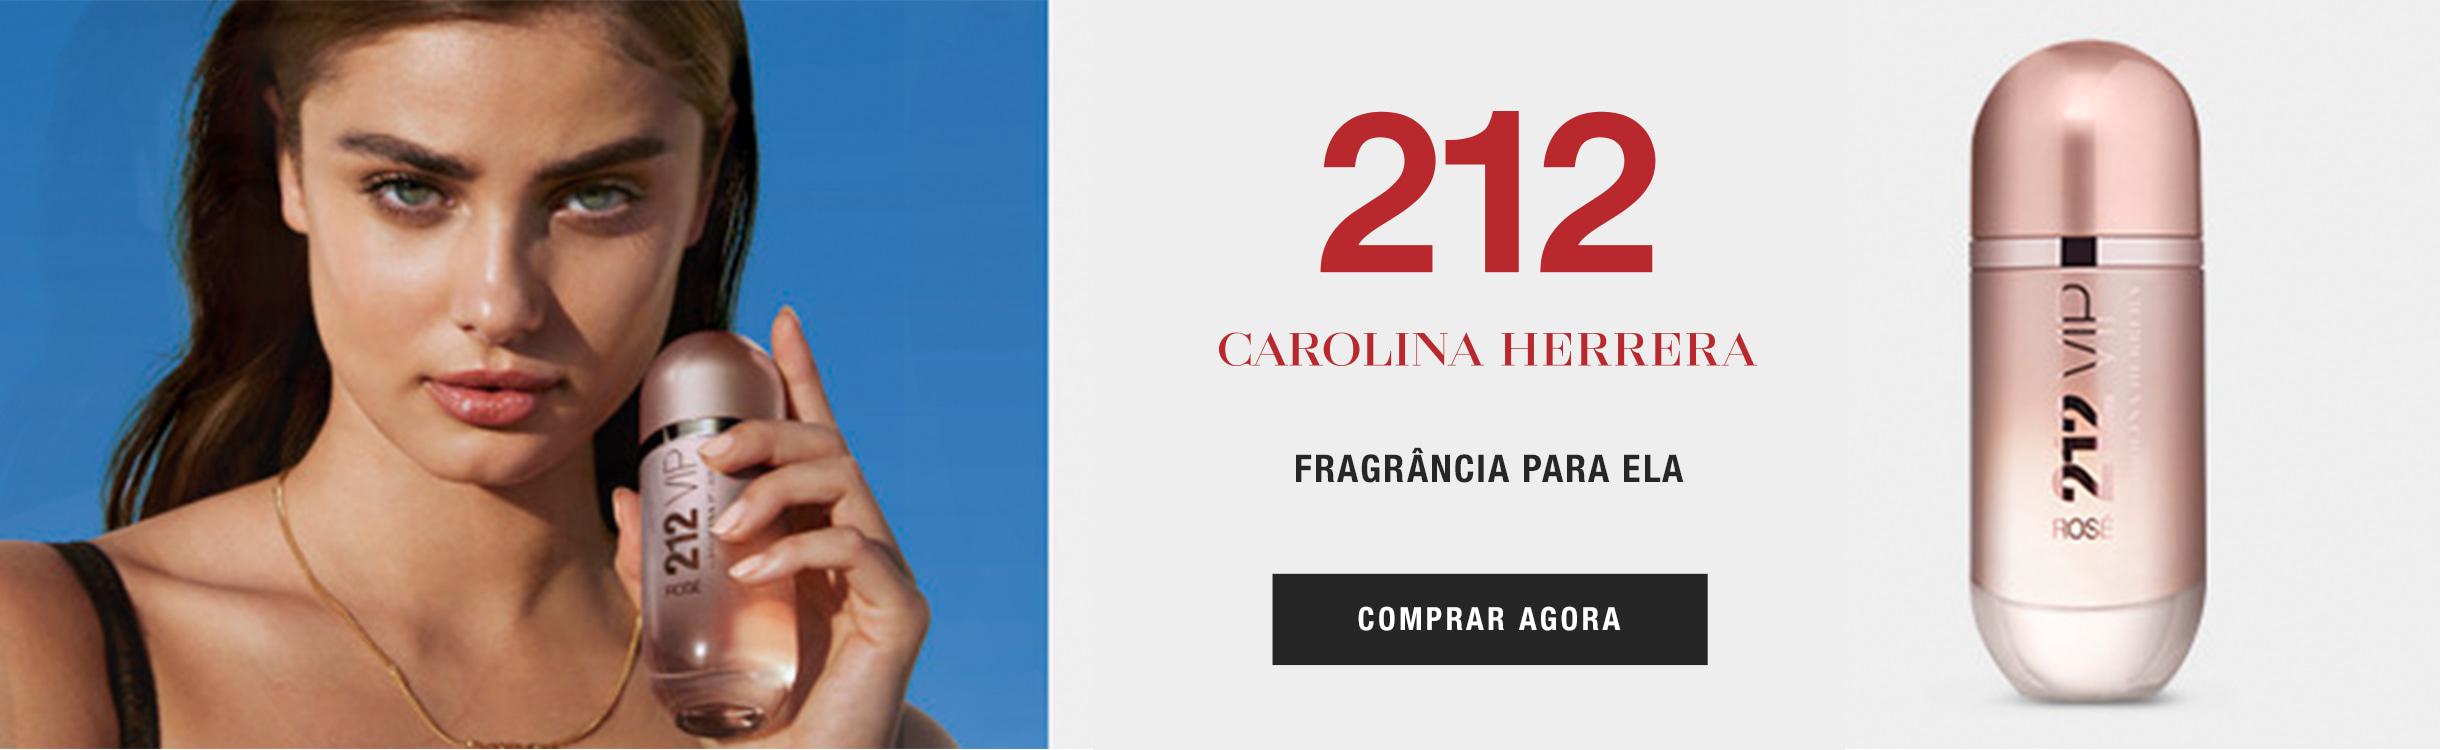 Carolina herrera/Perfumes e Perfumaria/Cuidados pos banho/Desodorante